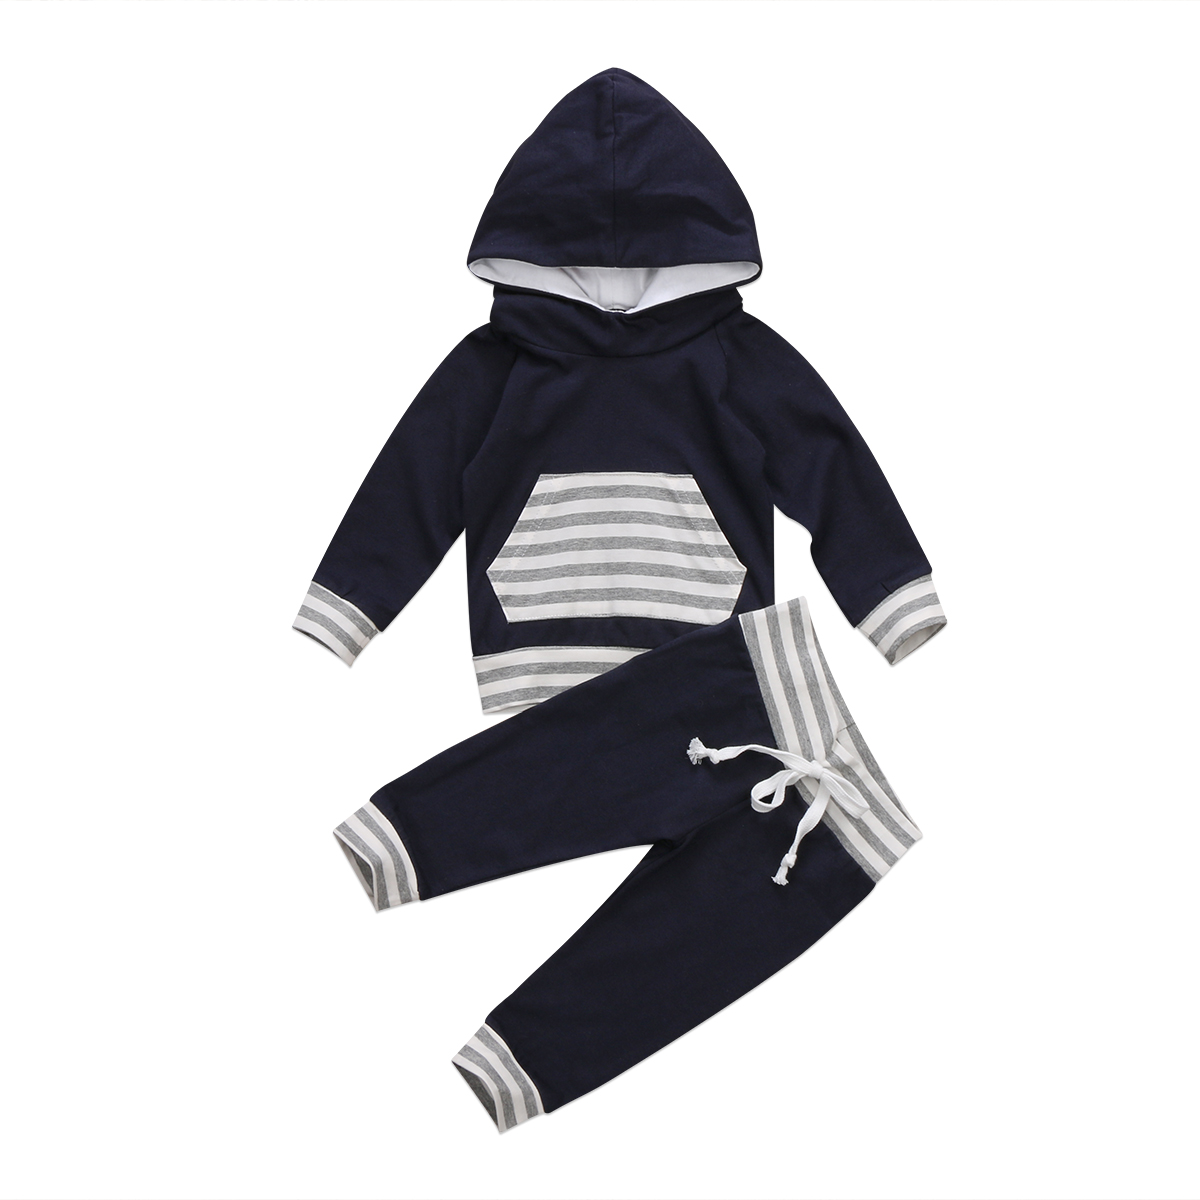 2pcs!!Autumn Toddler Infant Baby Boys Clothes Set Cotton Hooded Tops T-shirt Pants Leggings Outfits Set Clothes